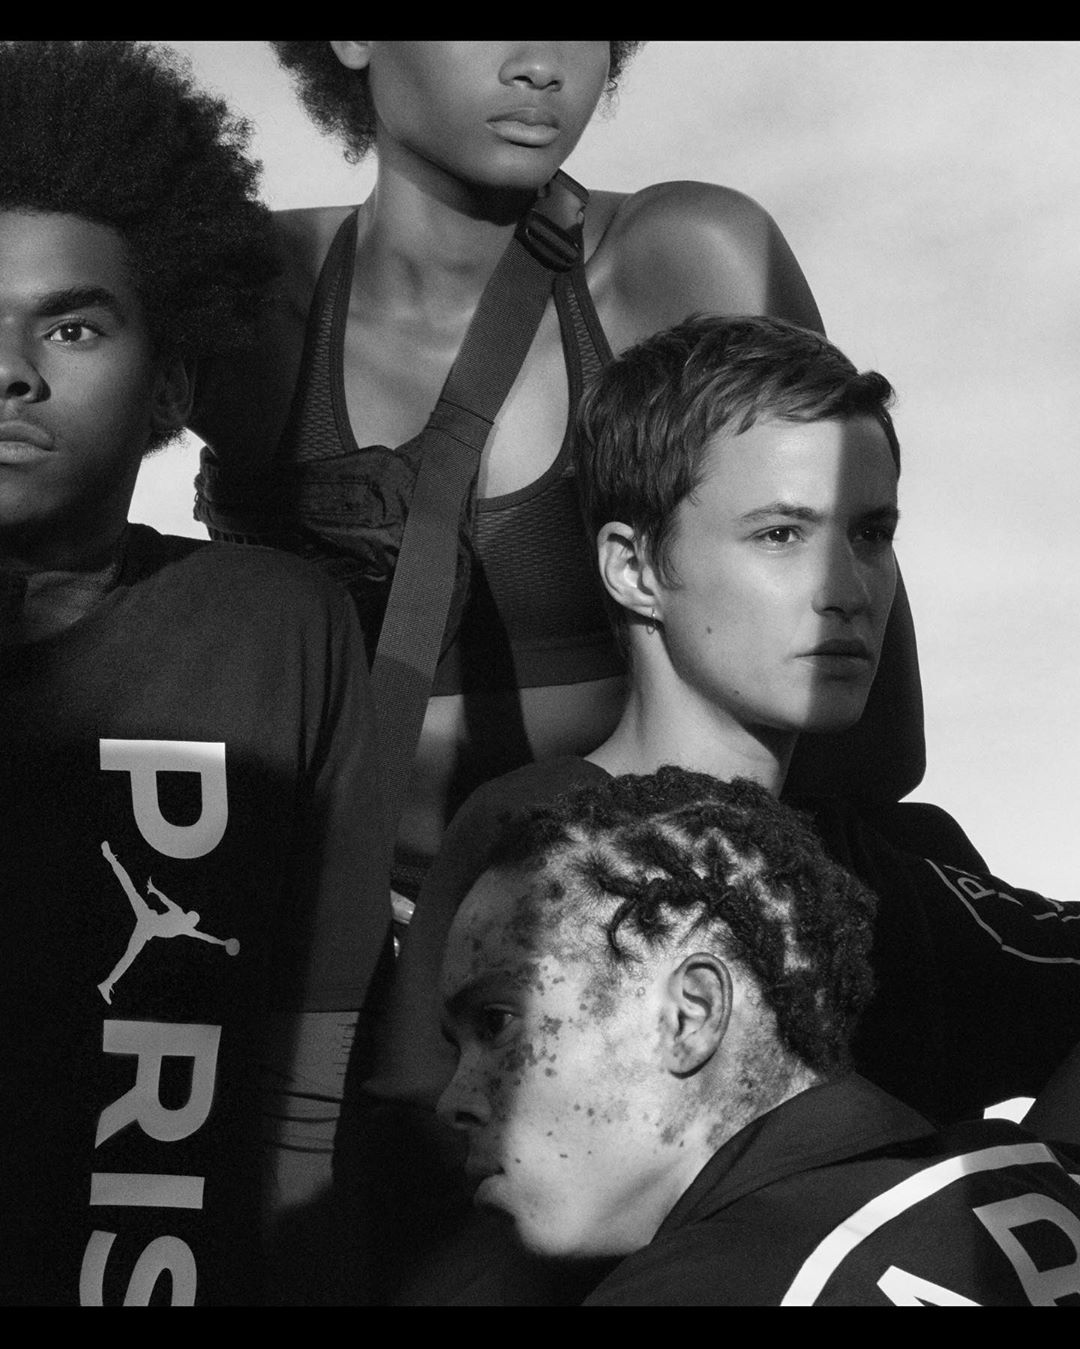 Nike -PSG x Jordan w/ @charlesnegre @rubio.julie @nikefootball #2018